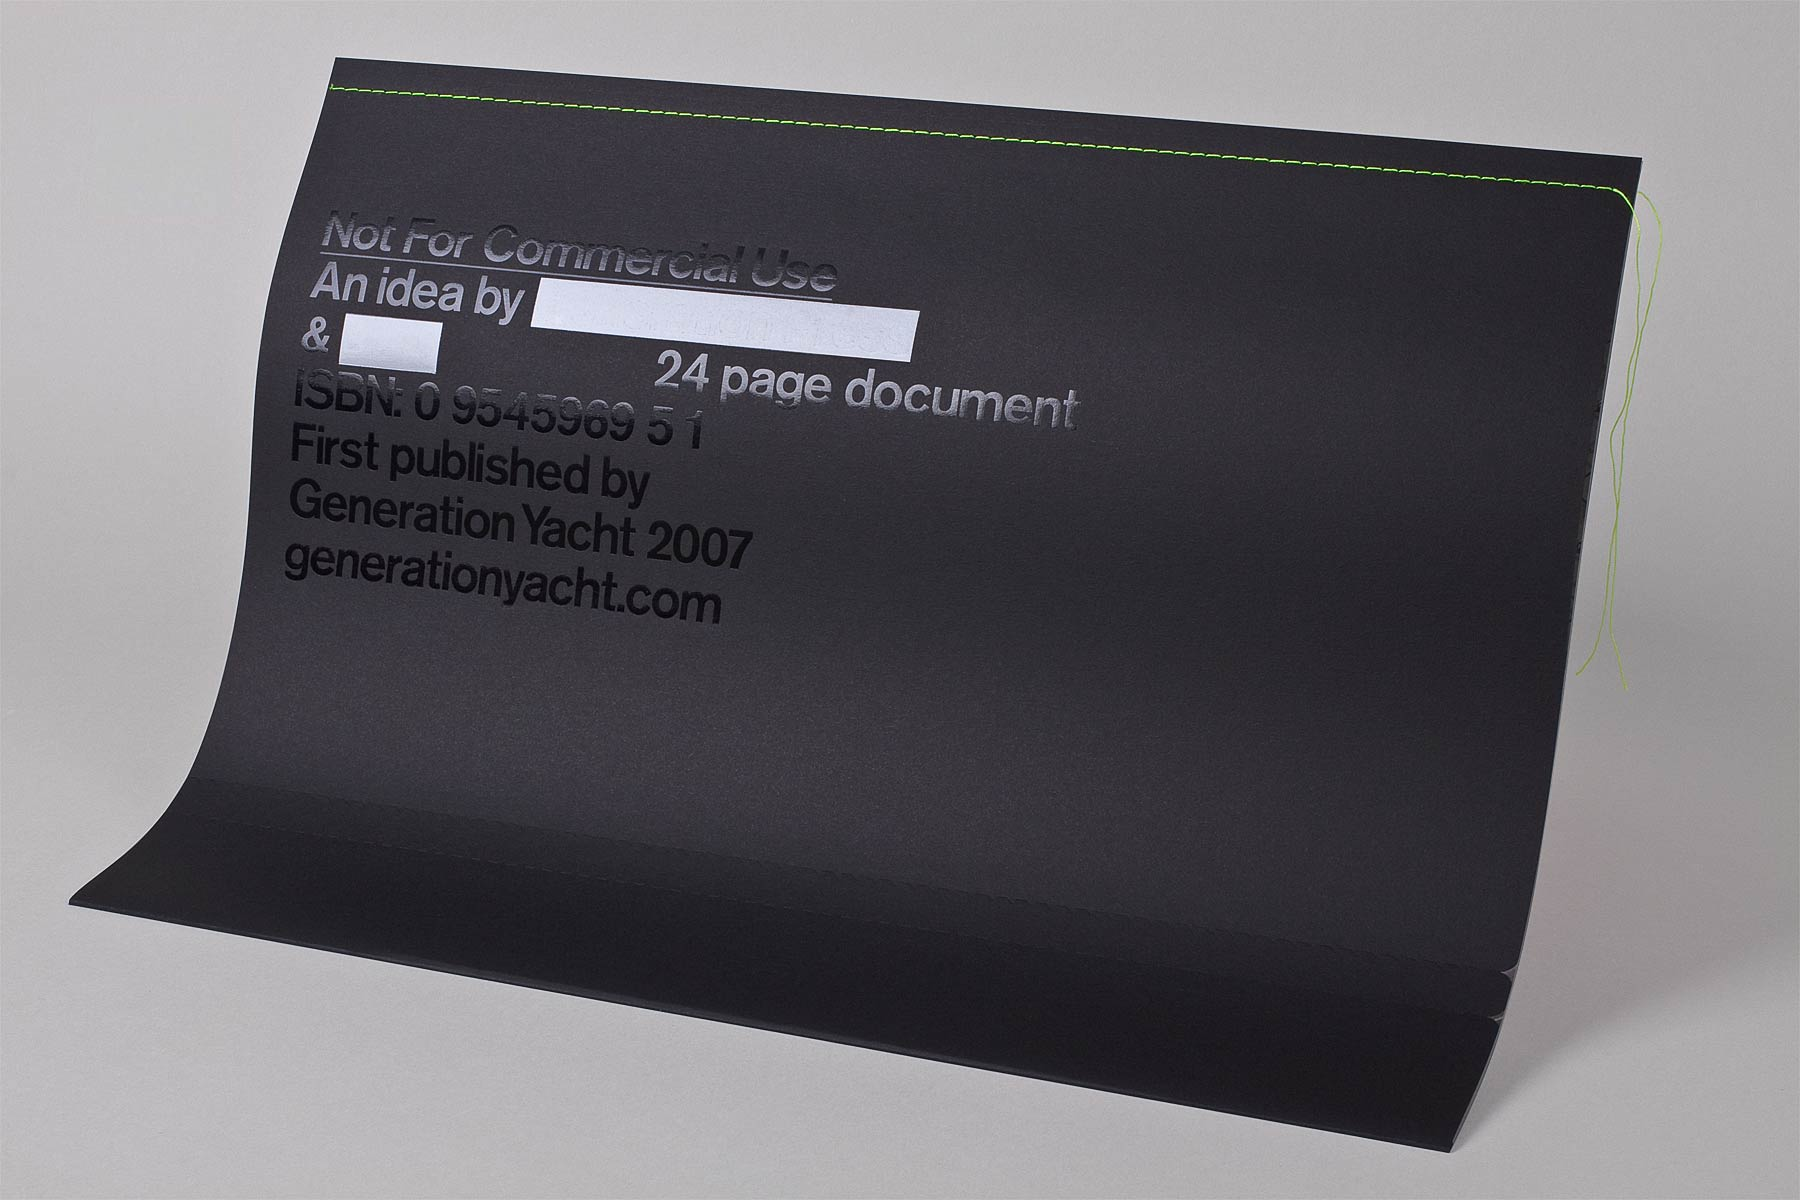 Build— +44(0)208 521 1040 / NFCU-Paste